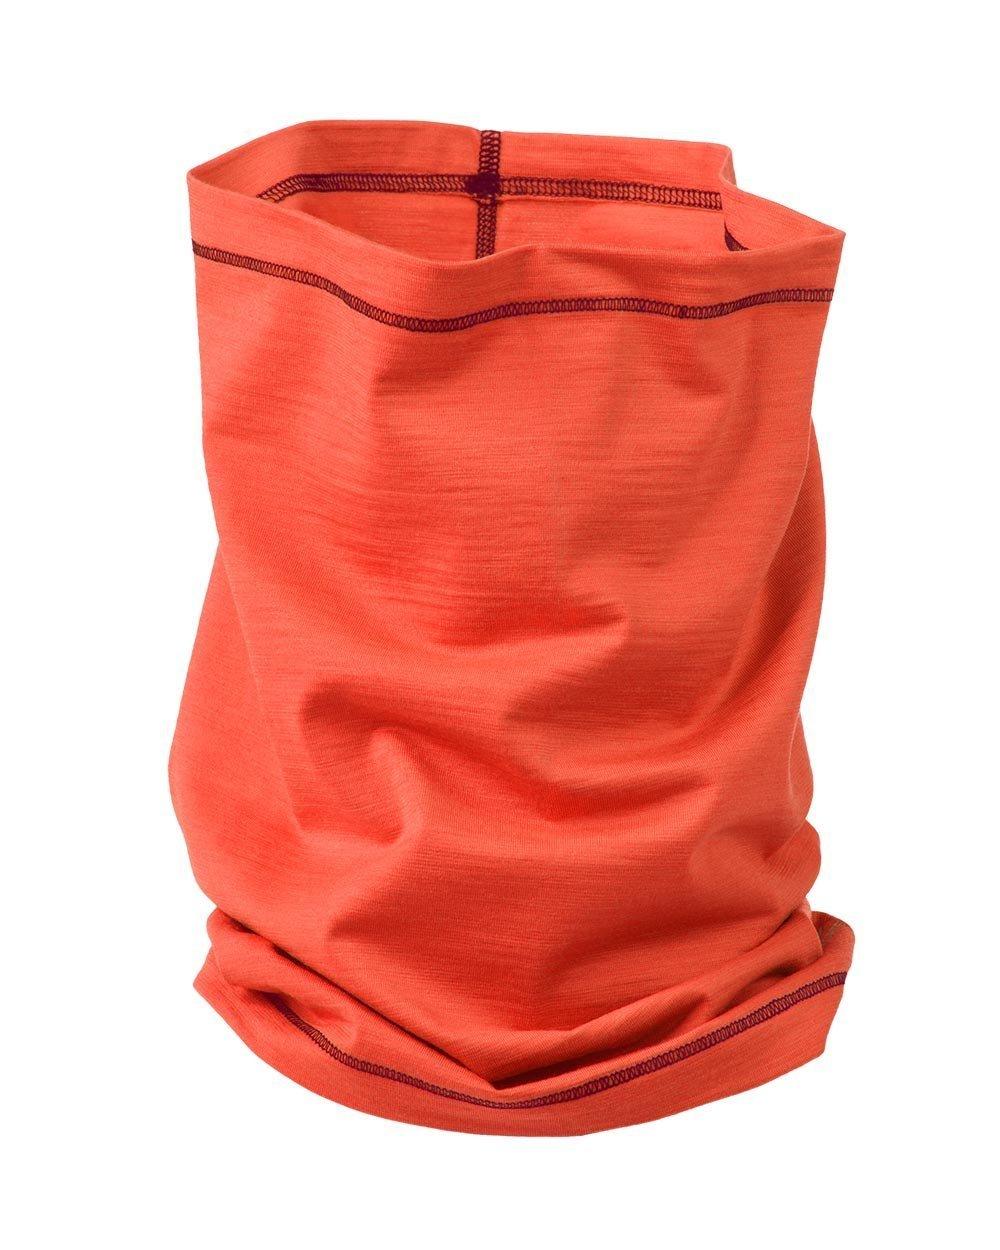 Engel Sports Women's Loop Scarf 70% Organic Merino Wool 28% Silk 2% Elastane (Spicy) by Engel Sports